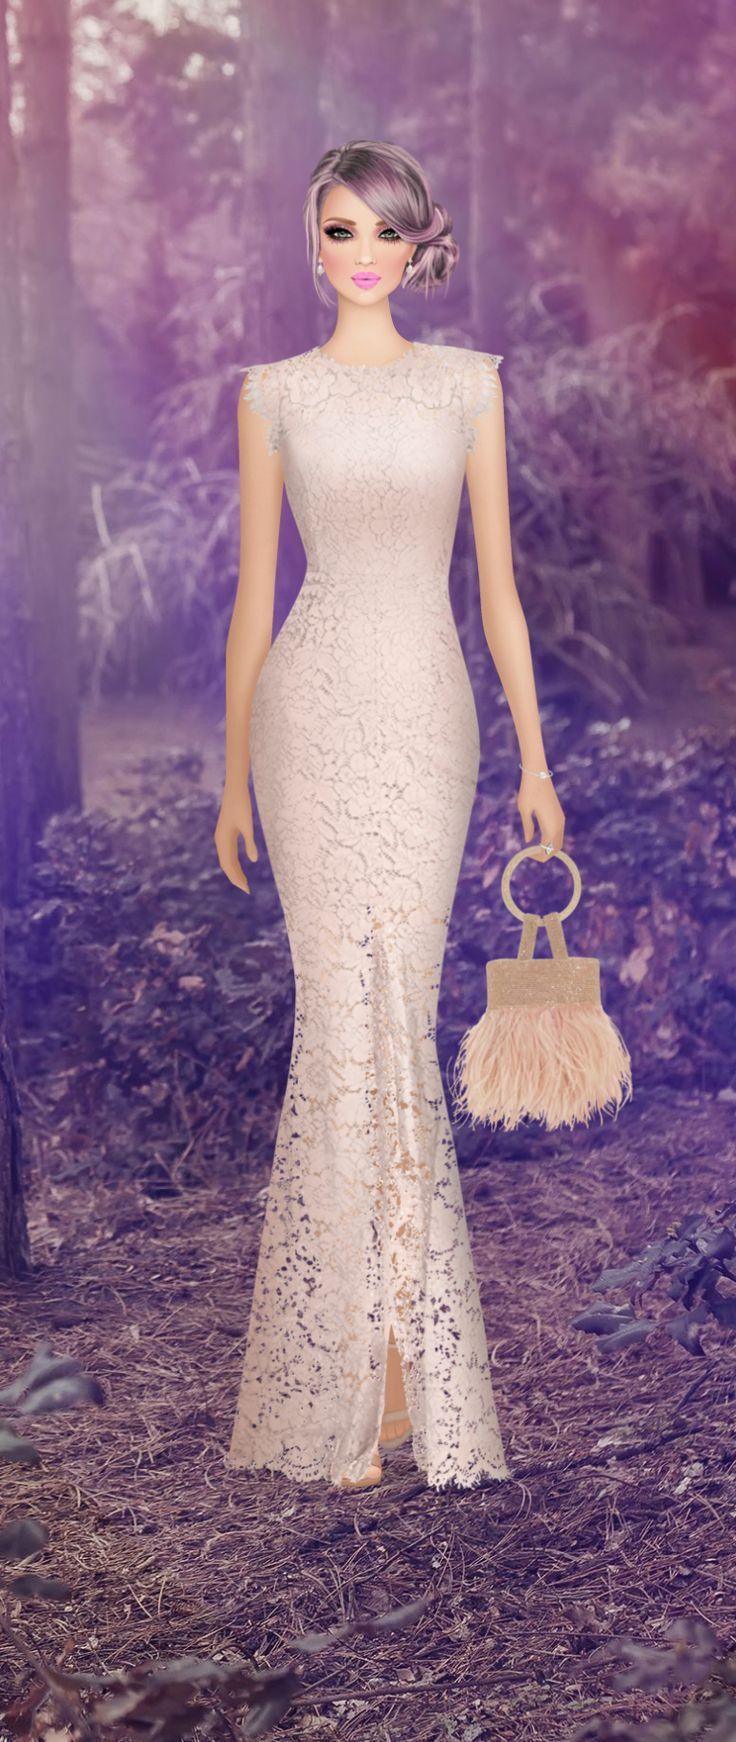 6642 best vestidos largos y de noche images on Pinterest | Alta ...